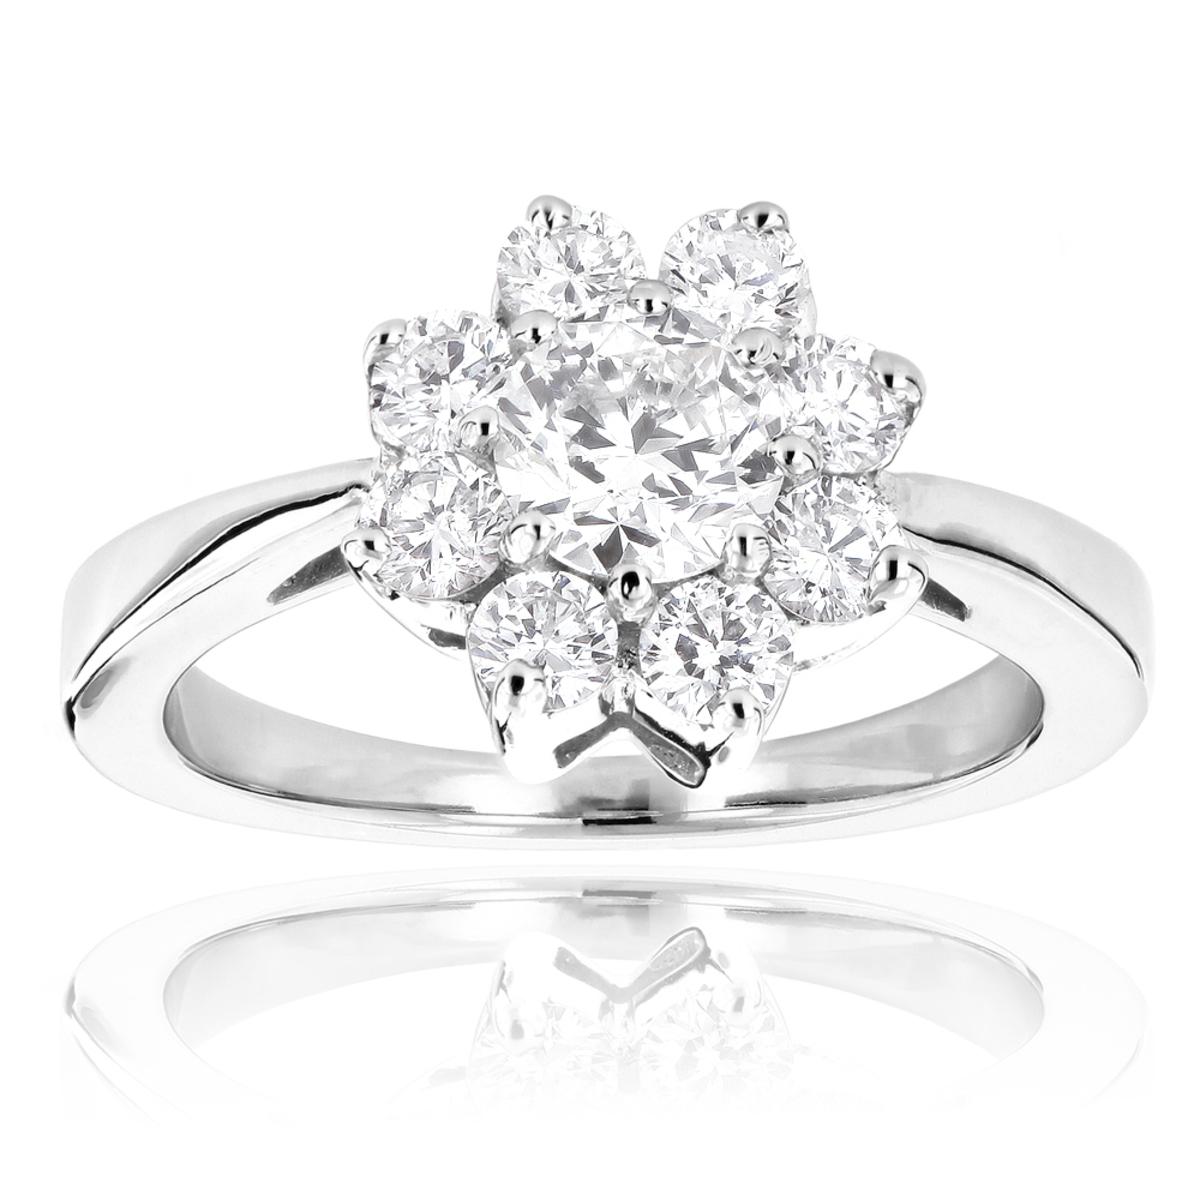 Ladies Diamond Cluster Rings: 14K Gold Diamond Flower Ring 1.2ct